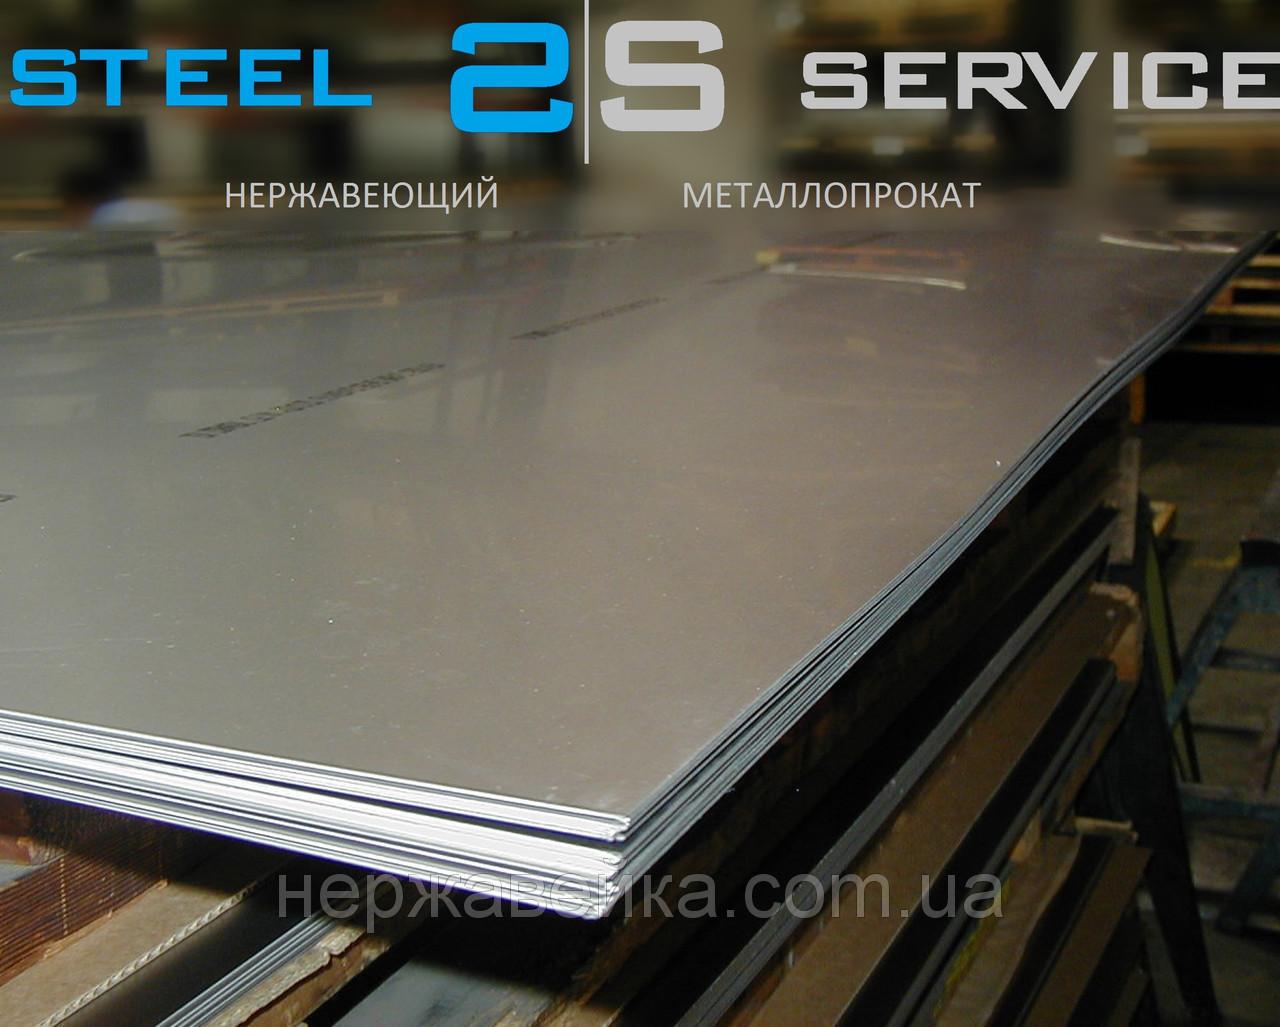 Нержавейка лист 12х1000х2000мм  AISI 316L(03Х17Н14М3) F1 - горячекатанный,  кислотостойкий